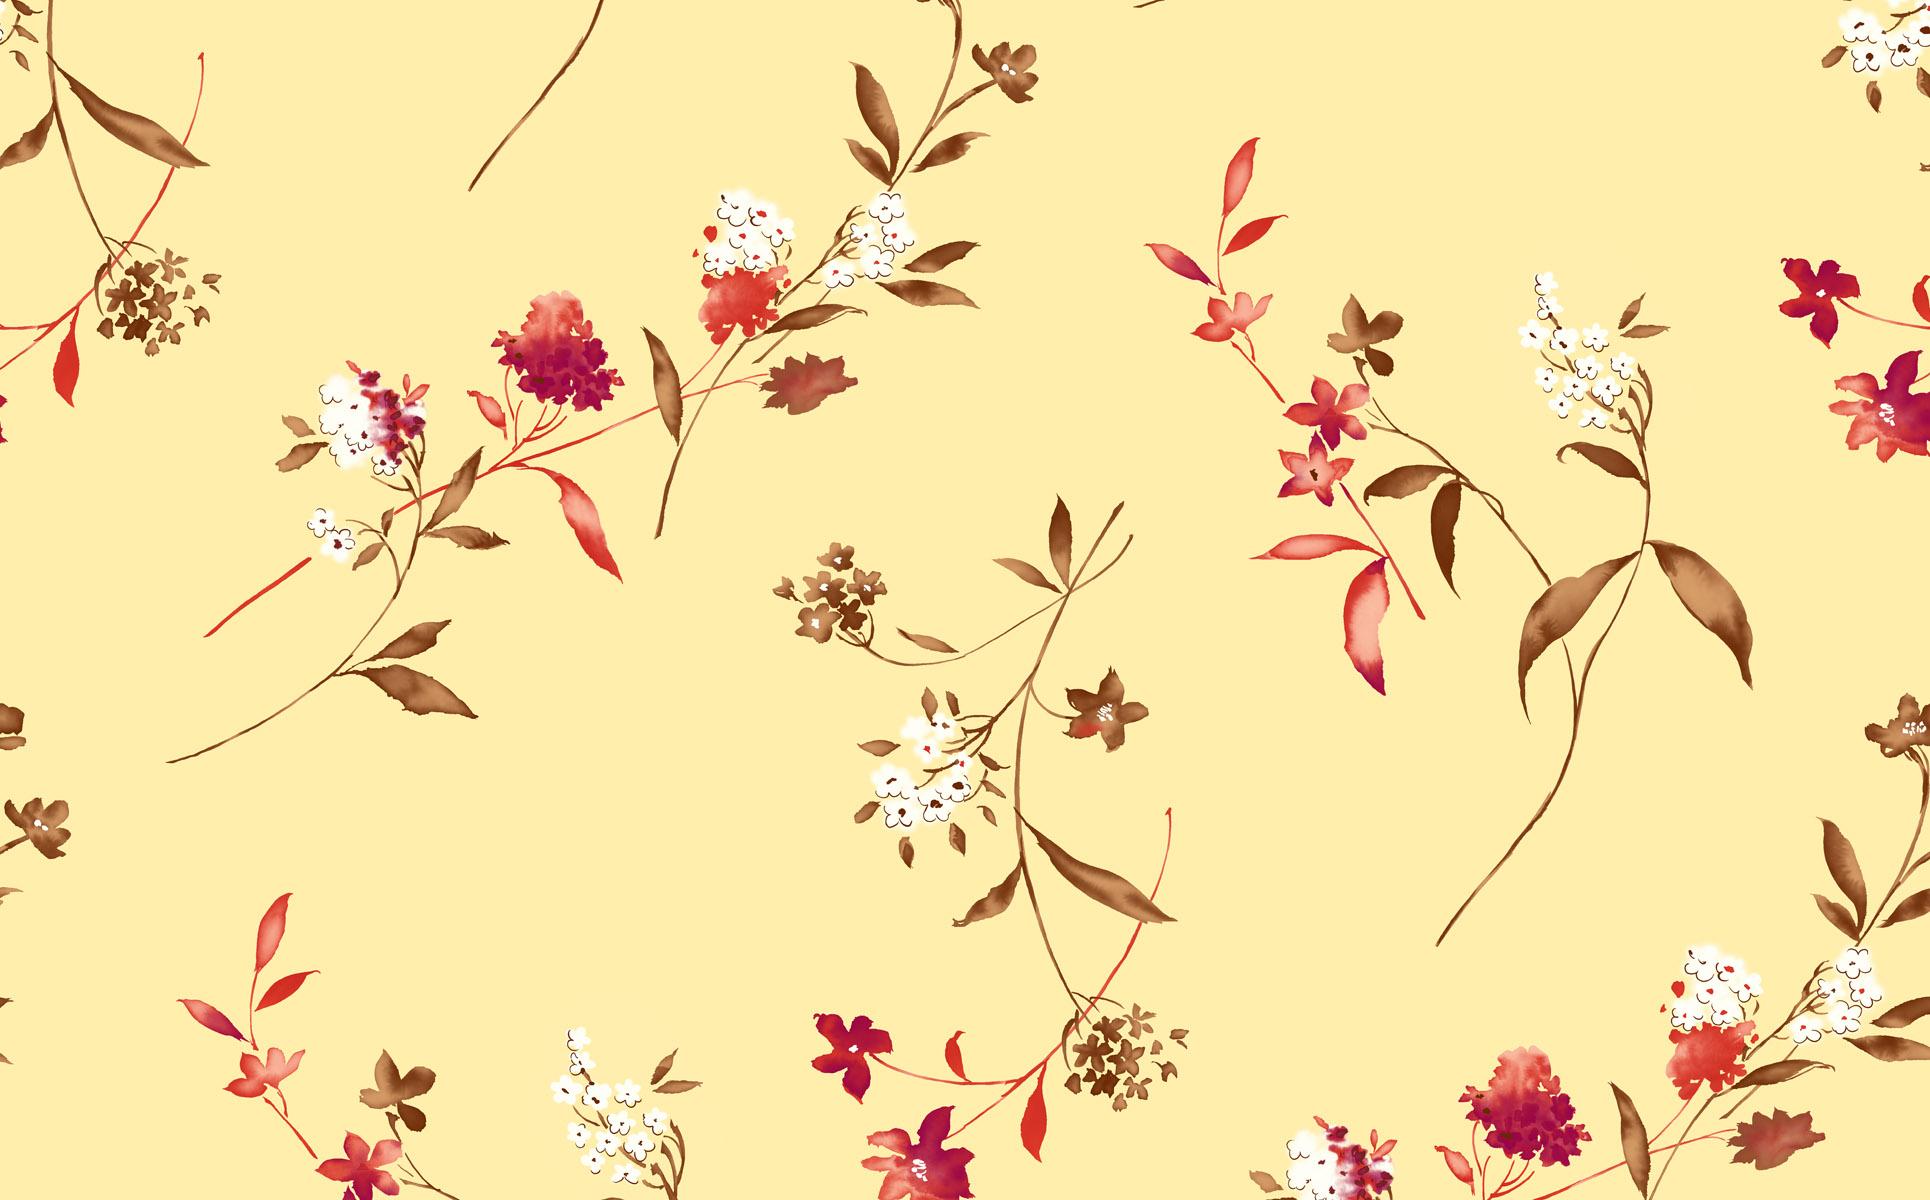 Background wallpaper pattern pattern 6157 - Background patterns - Others